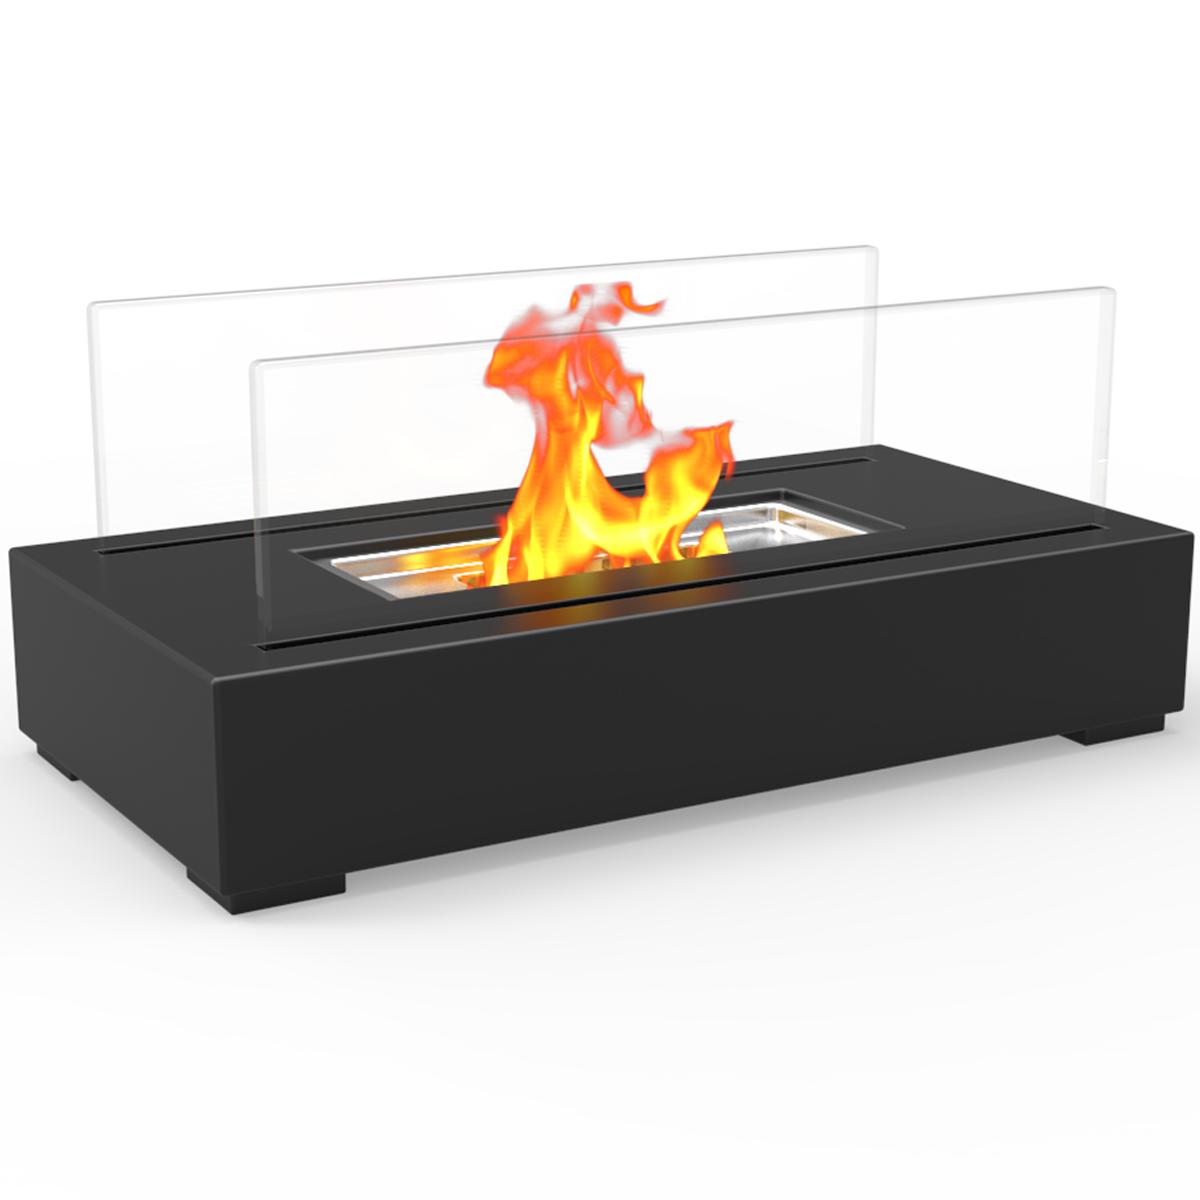 Utopia Ventless Tabletop Portable Bio Ethanol Fireplace In